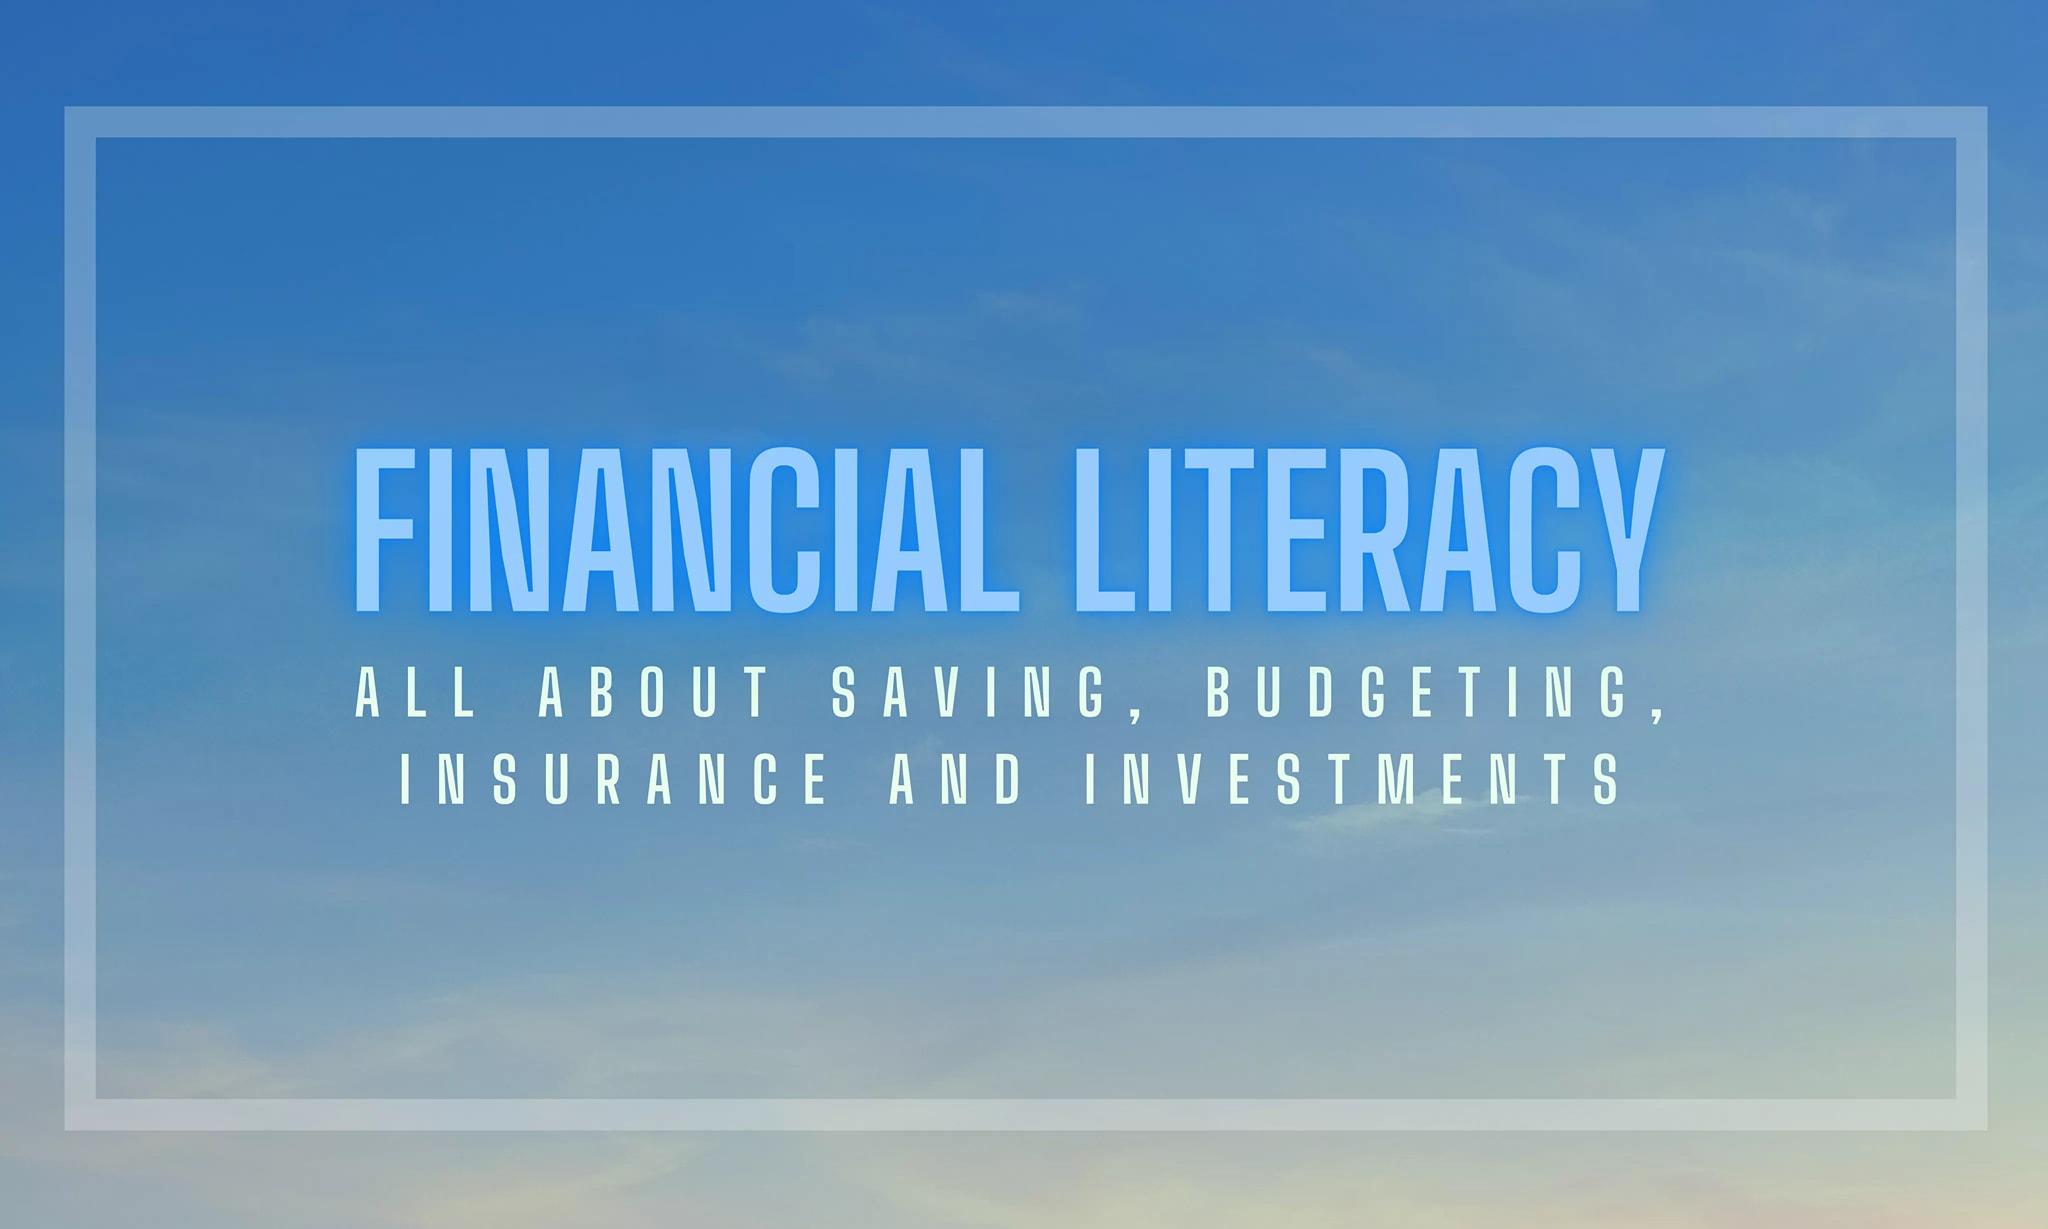 Financial Literacy Facebook group